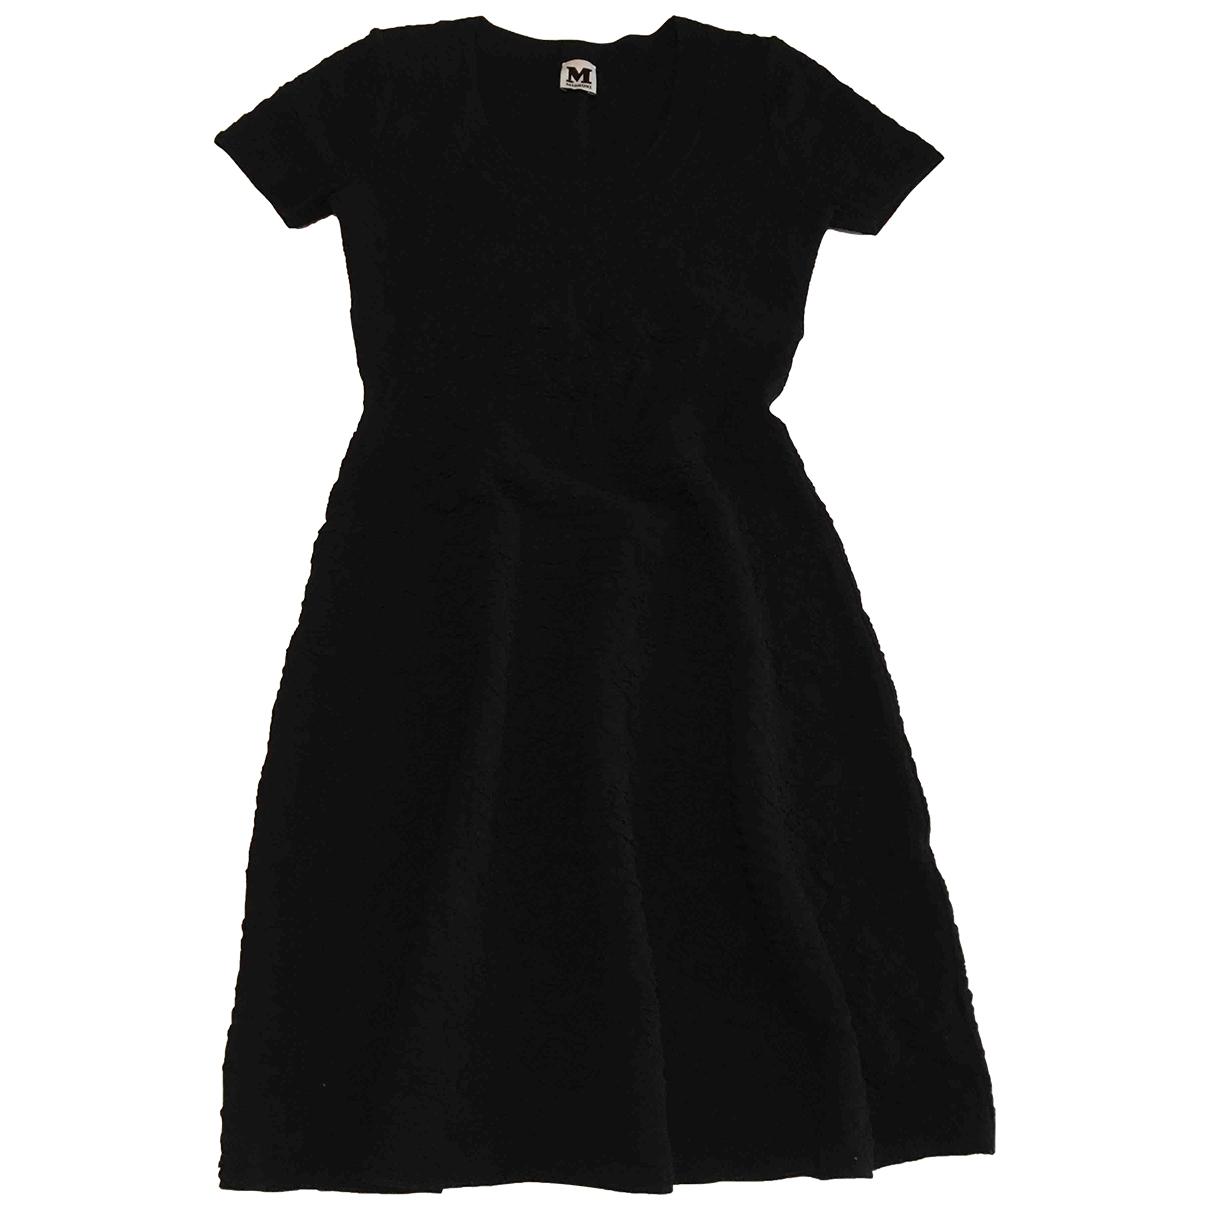 M Missoni \N Black dress for Women 42 IT